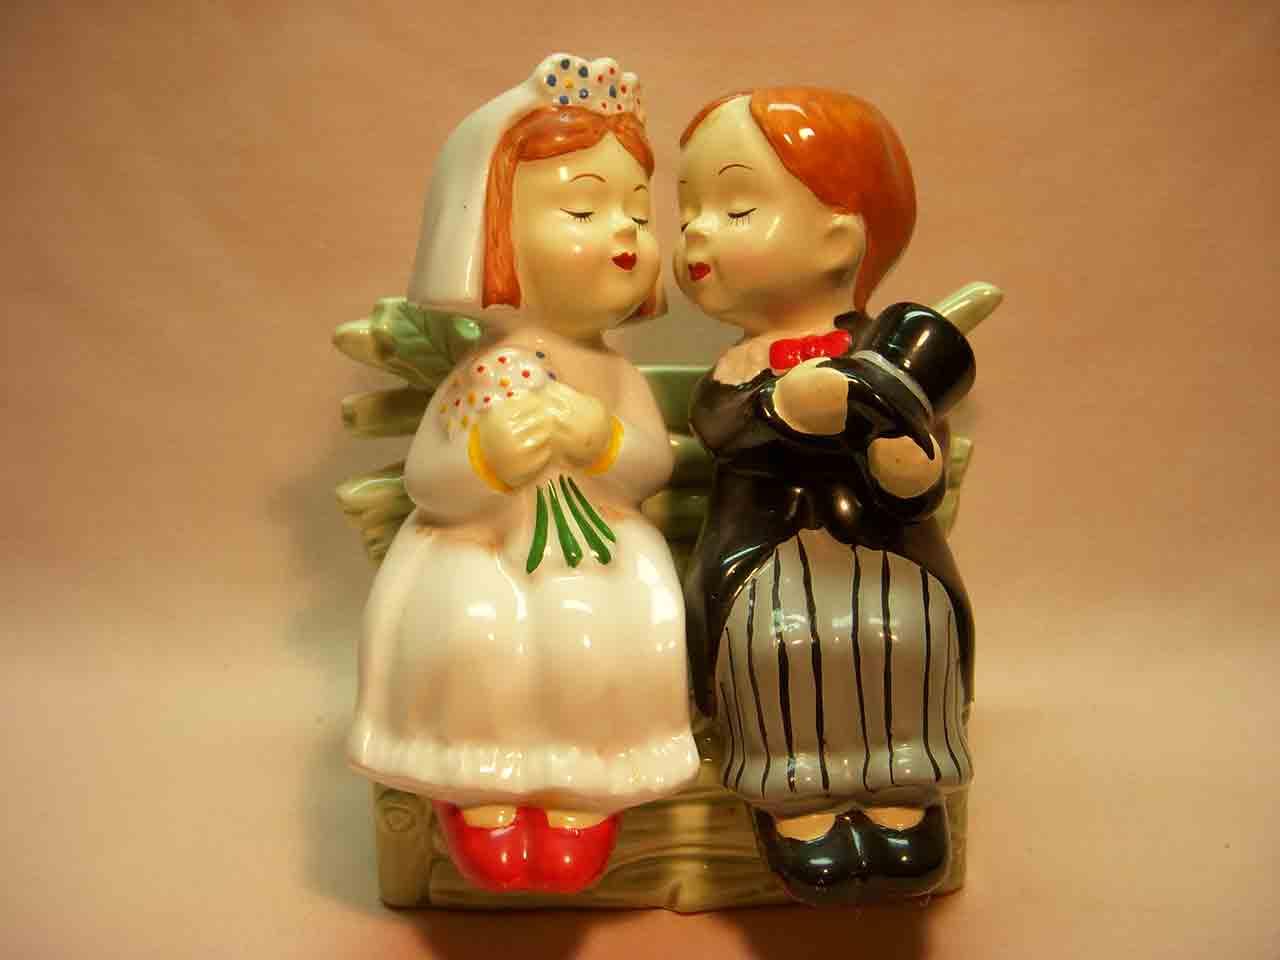 Wedding bride and groom sitting on ceramic bench salt and pepper shaker